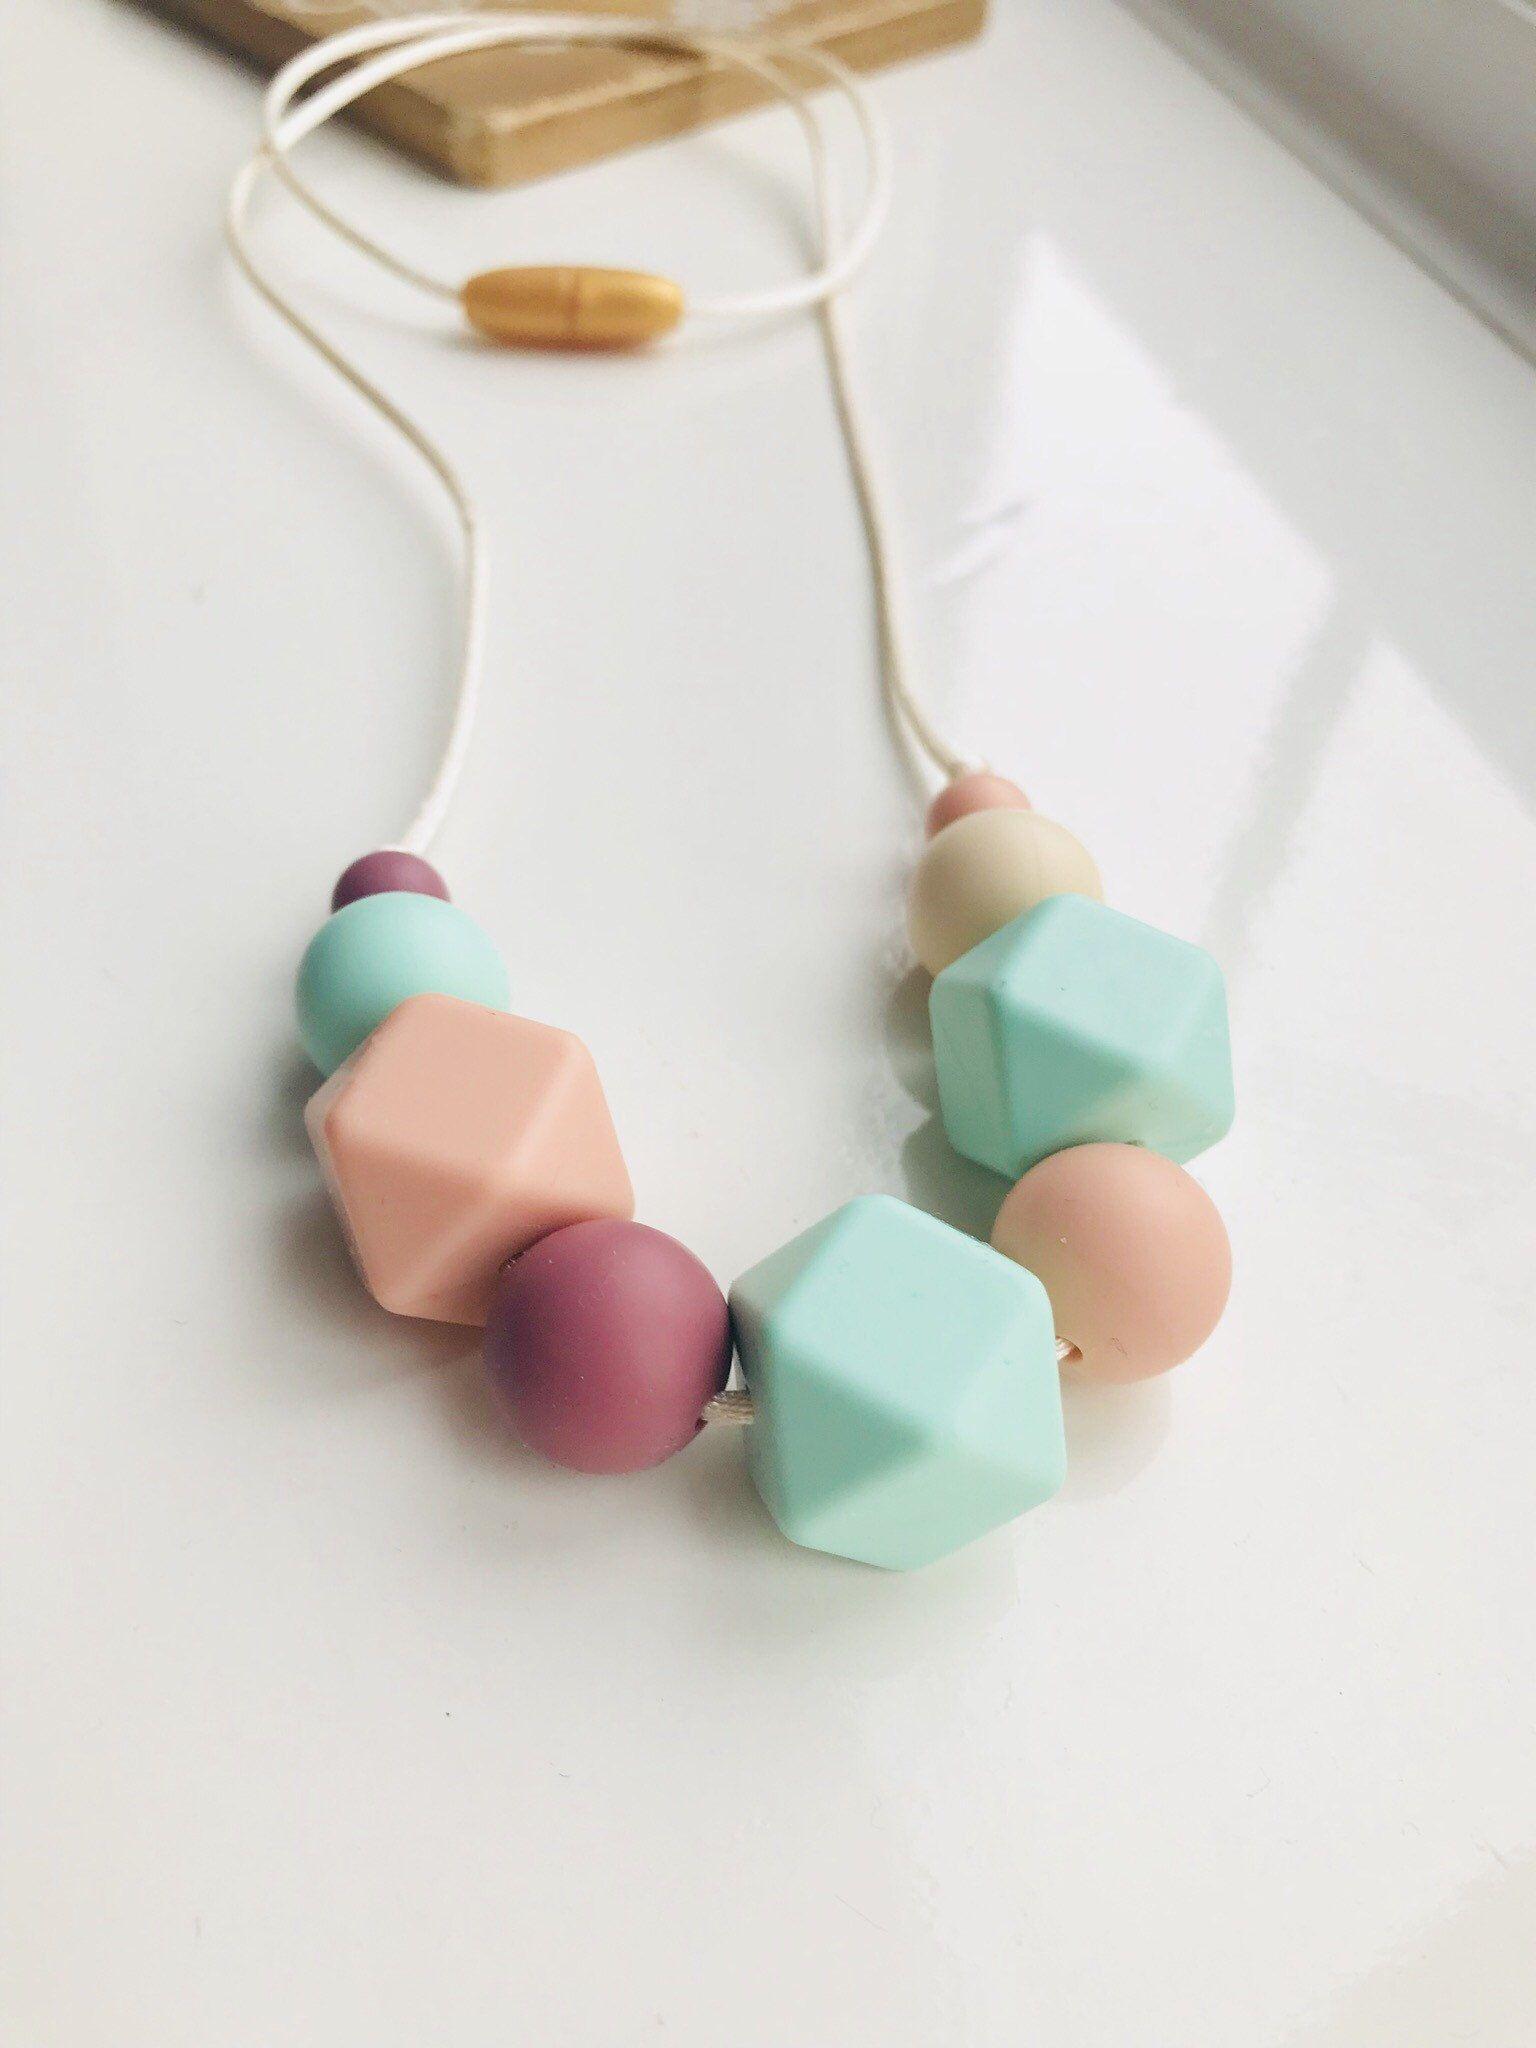 Teething Necklace Nursing//Sensory Jewellery Pink//Grey Marble Fiddle Beads